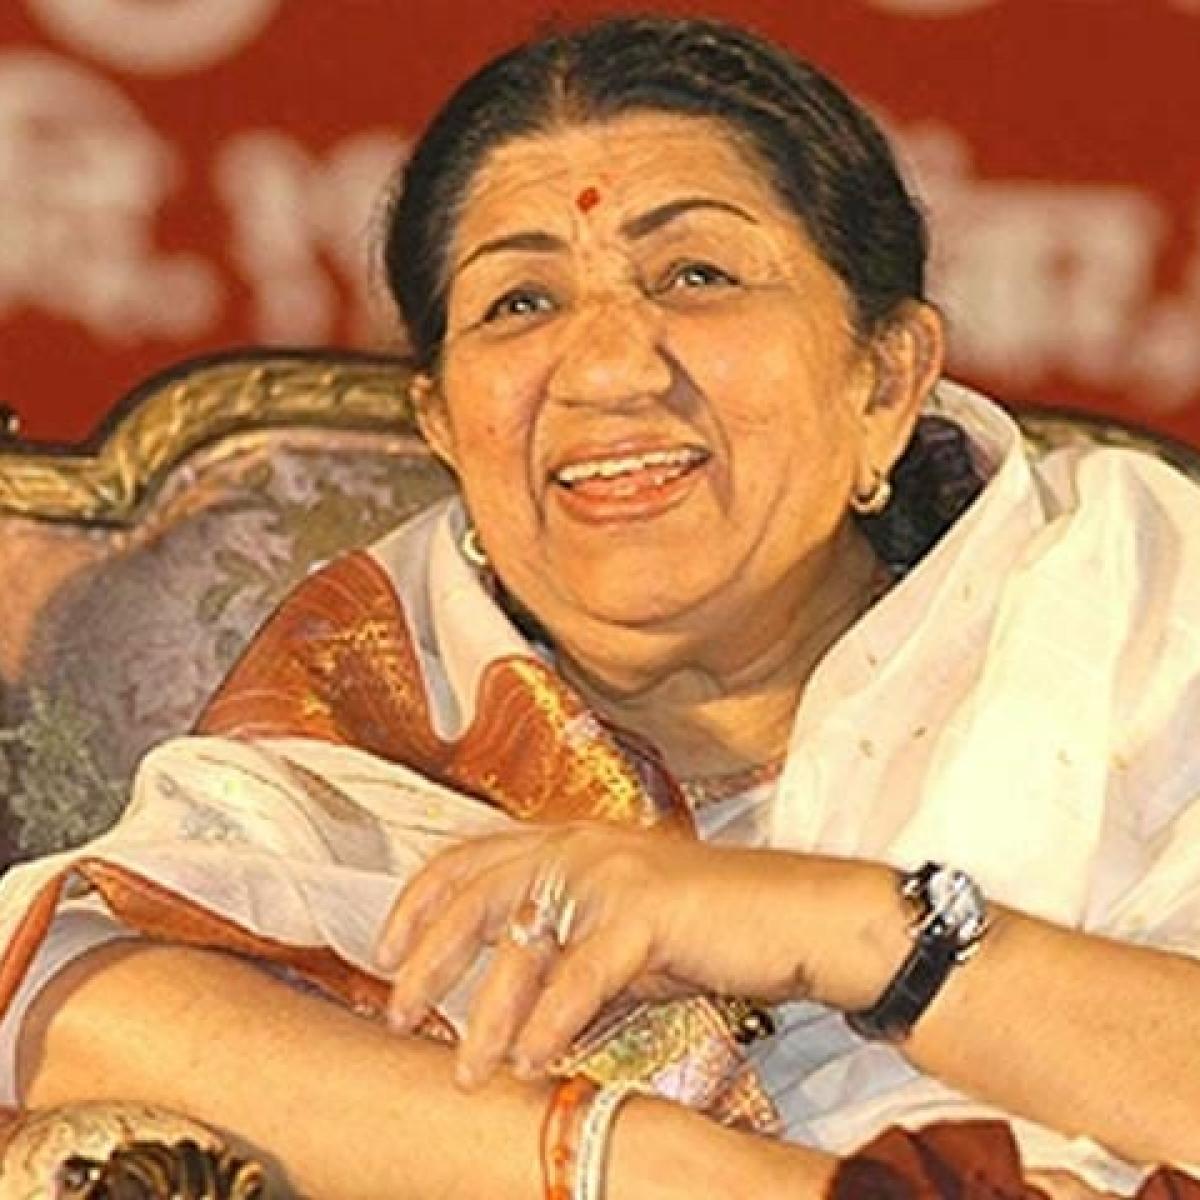 Lata Mangeshkar urges everyone to not 'panic' or 'spread rumours' amid coronavirus outbreak